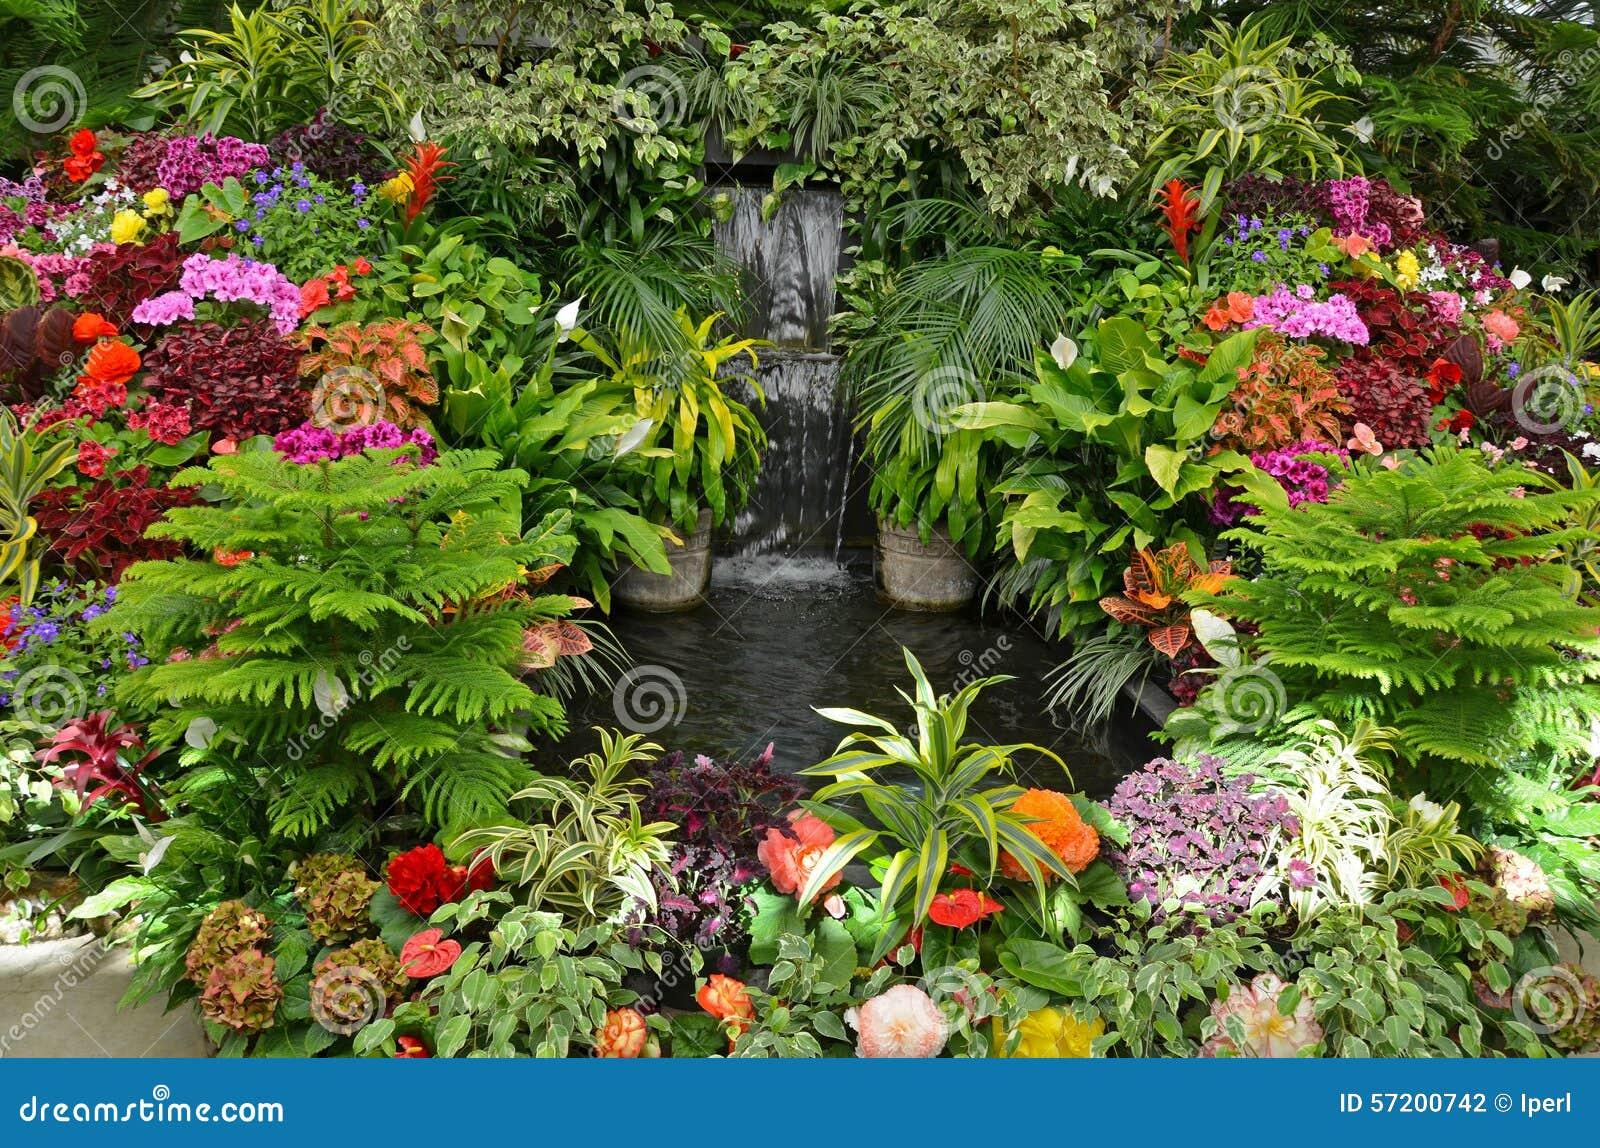 Jardin tropical color photo stock image 57200742 for Jardin tropical plantas